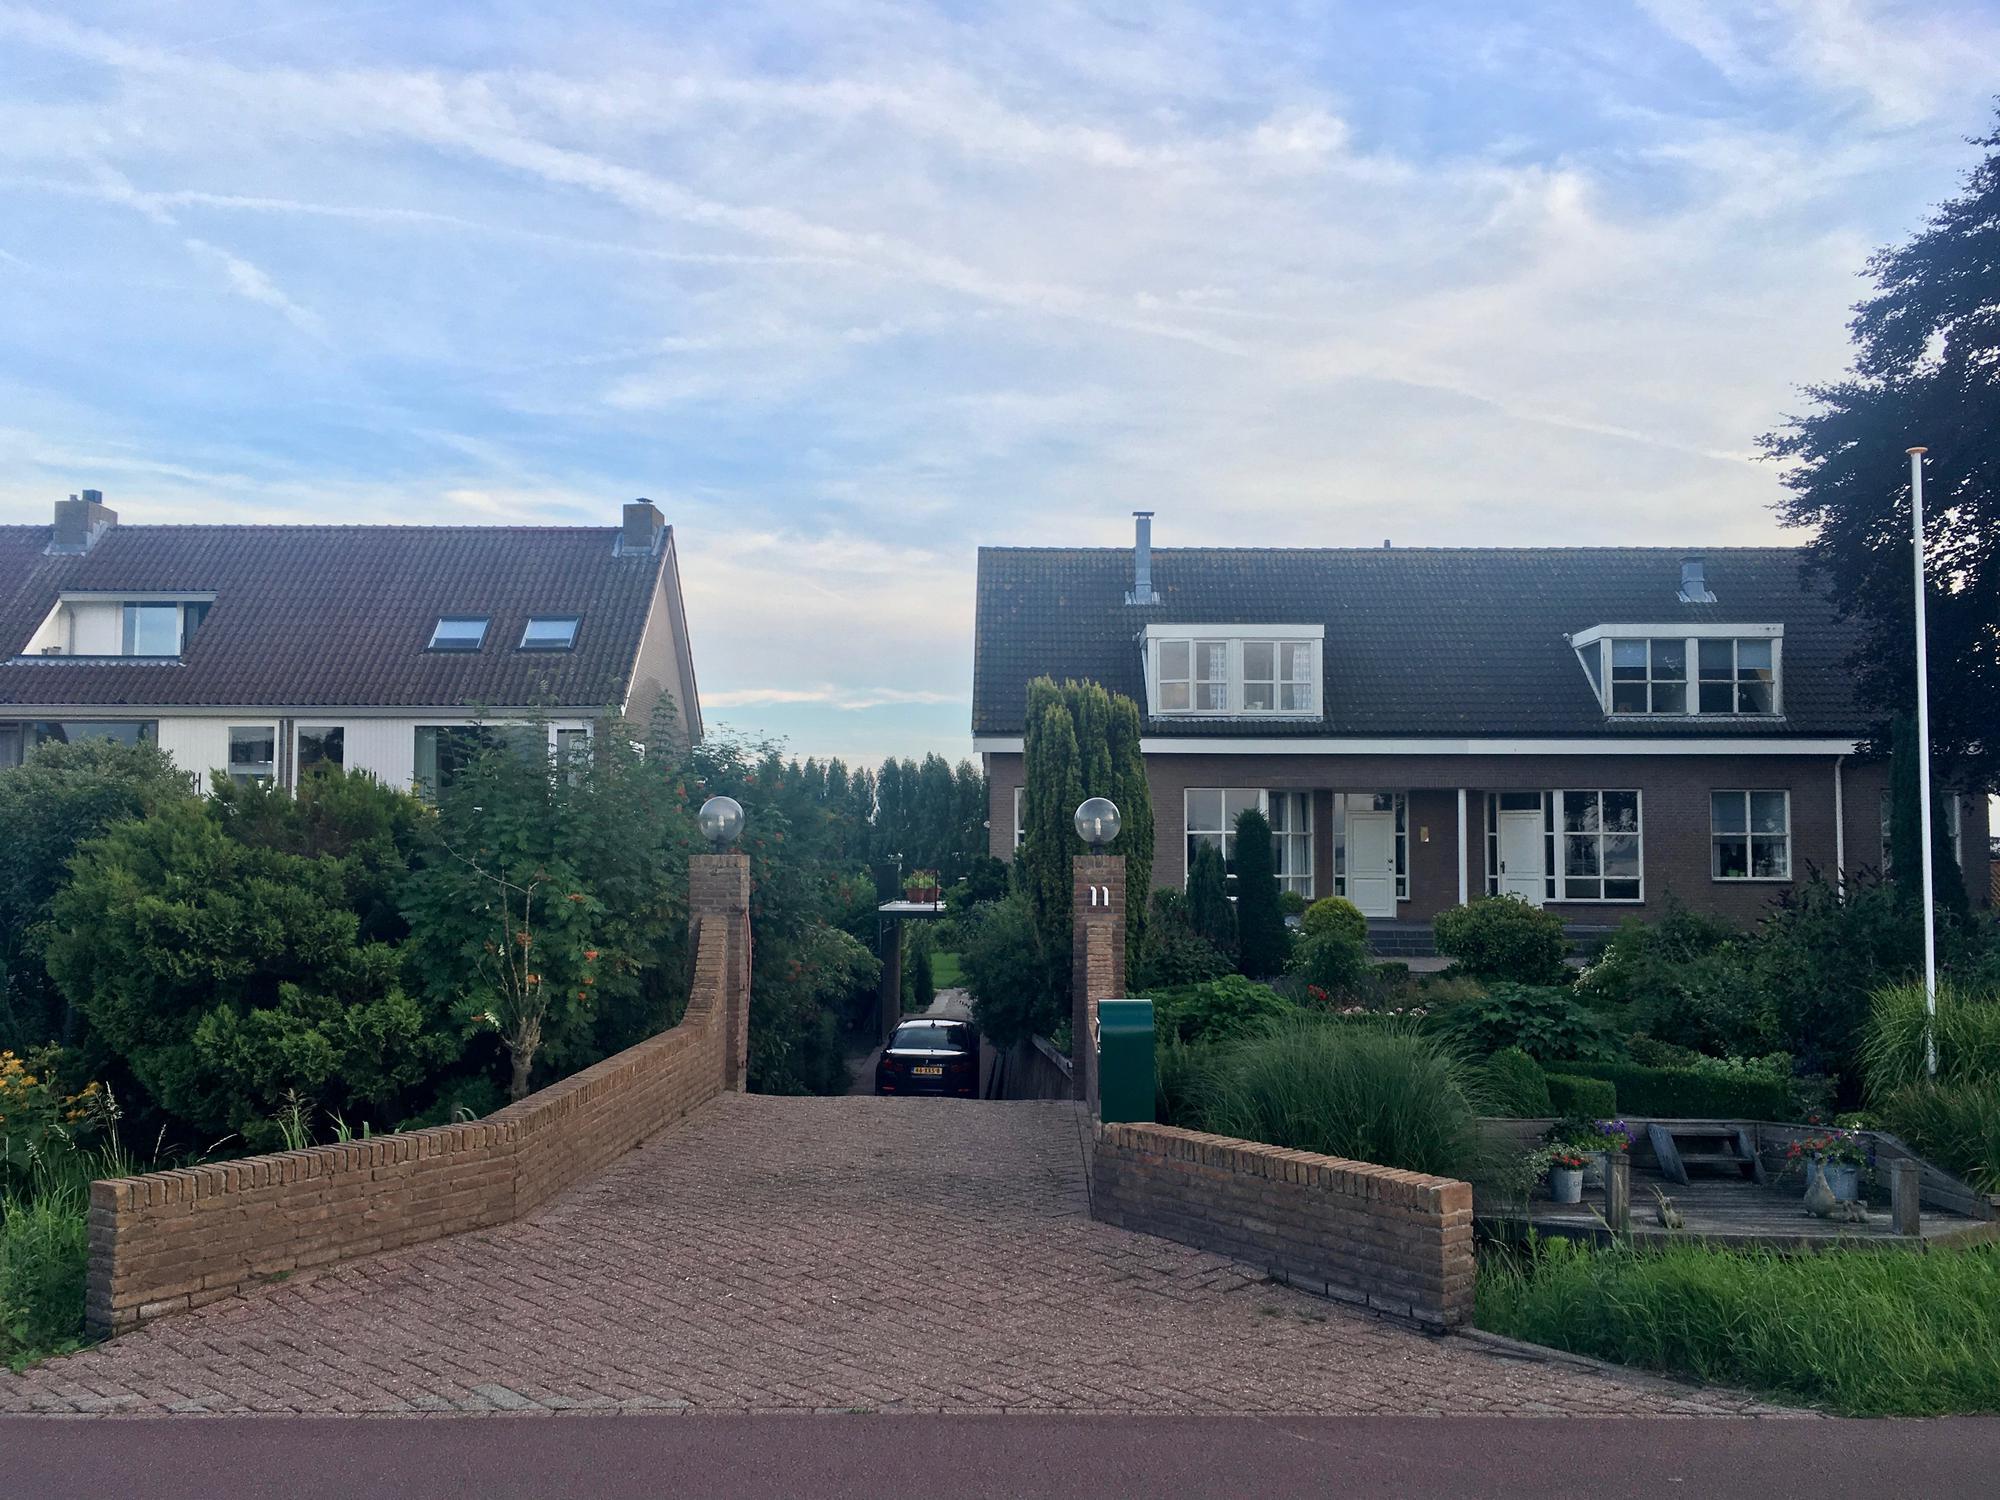 🇳🇱 Aalsmeer, Netherlands, july 2017.